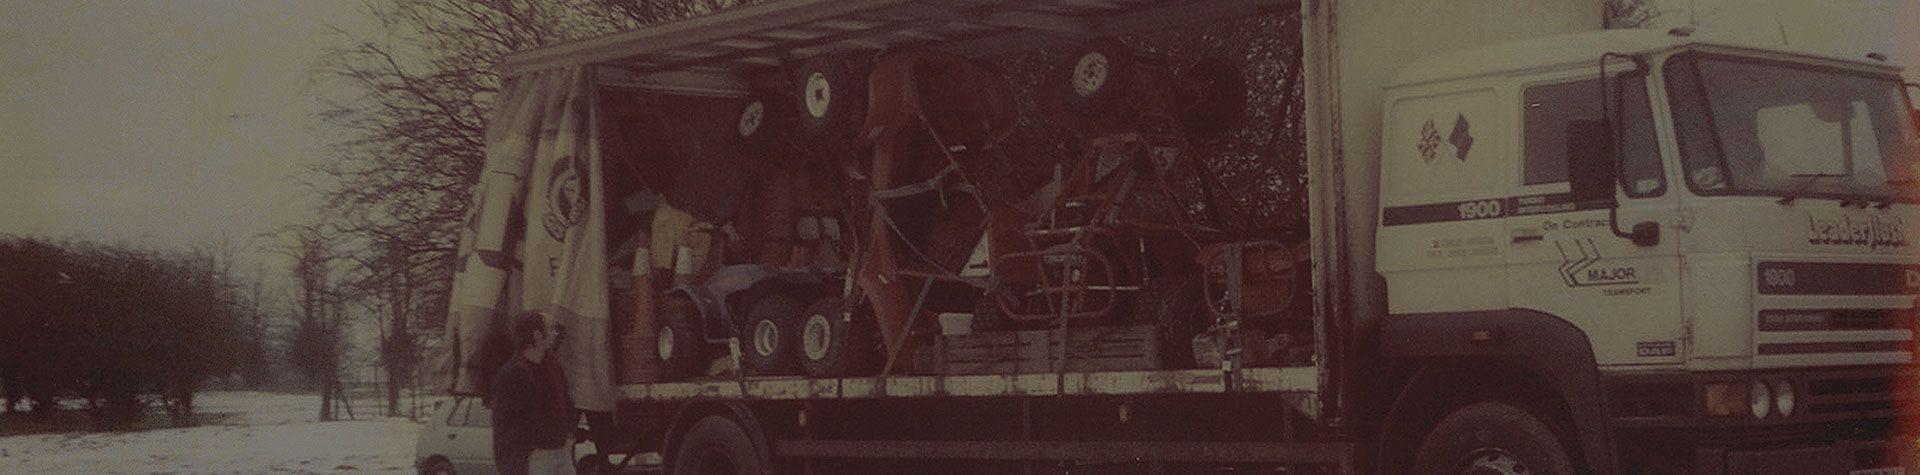 Off Limits unloading quad bikes off lorry